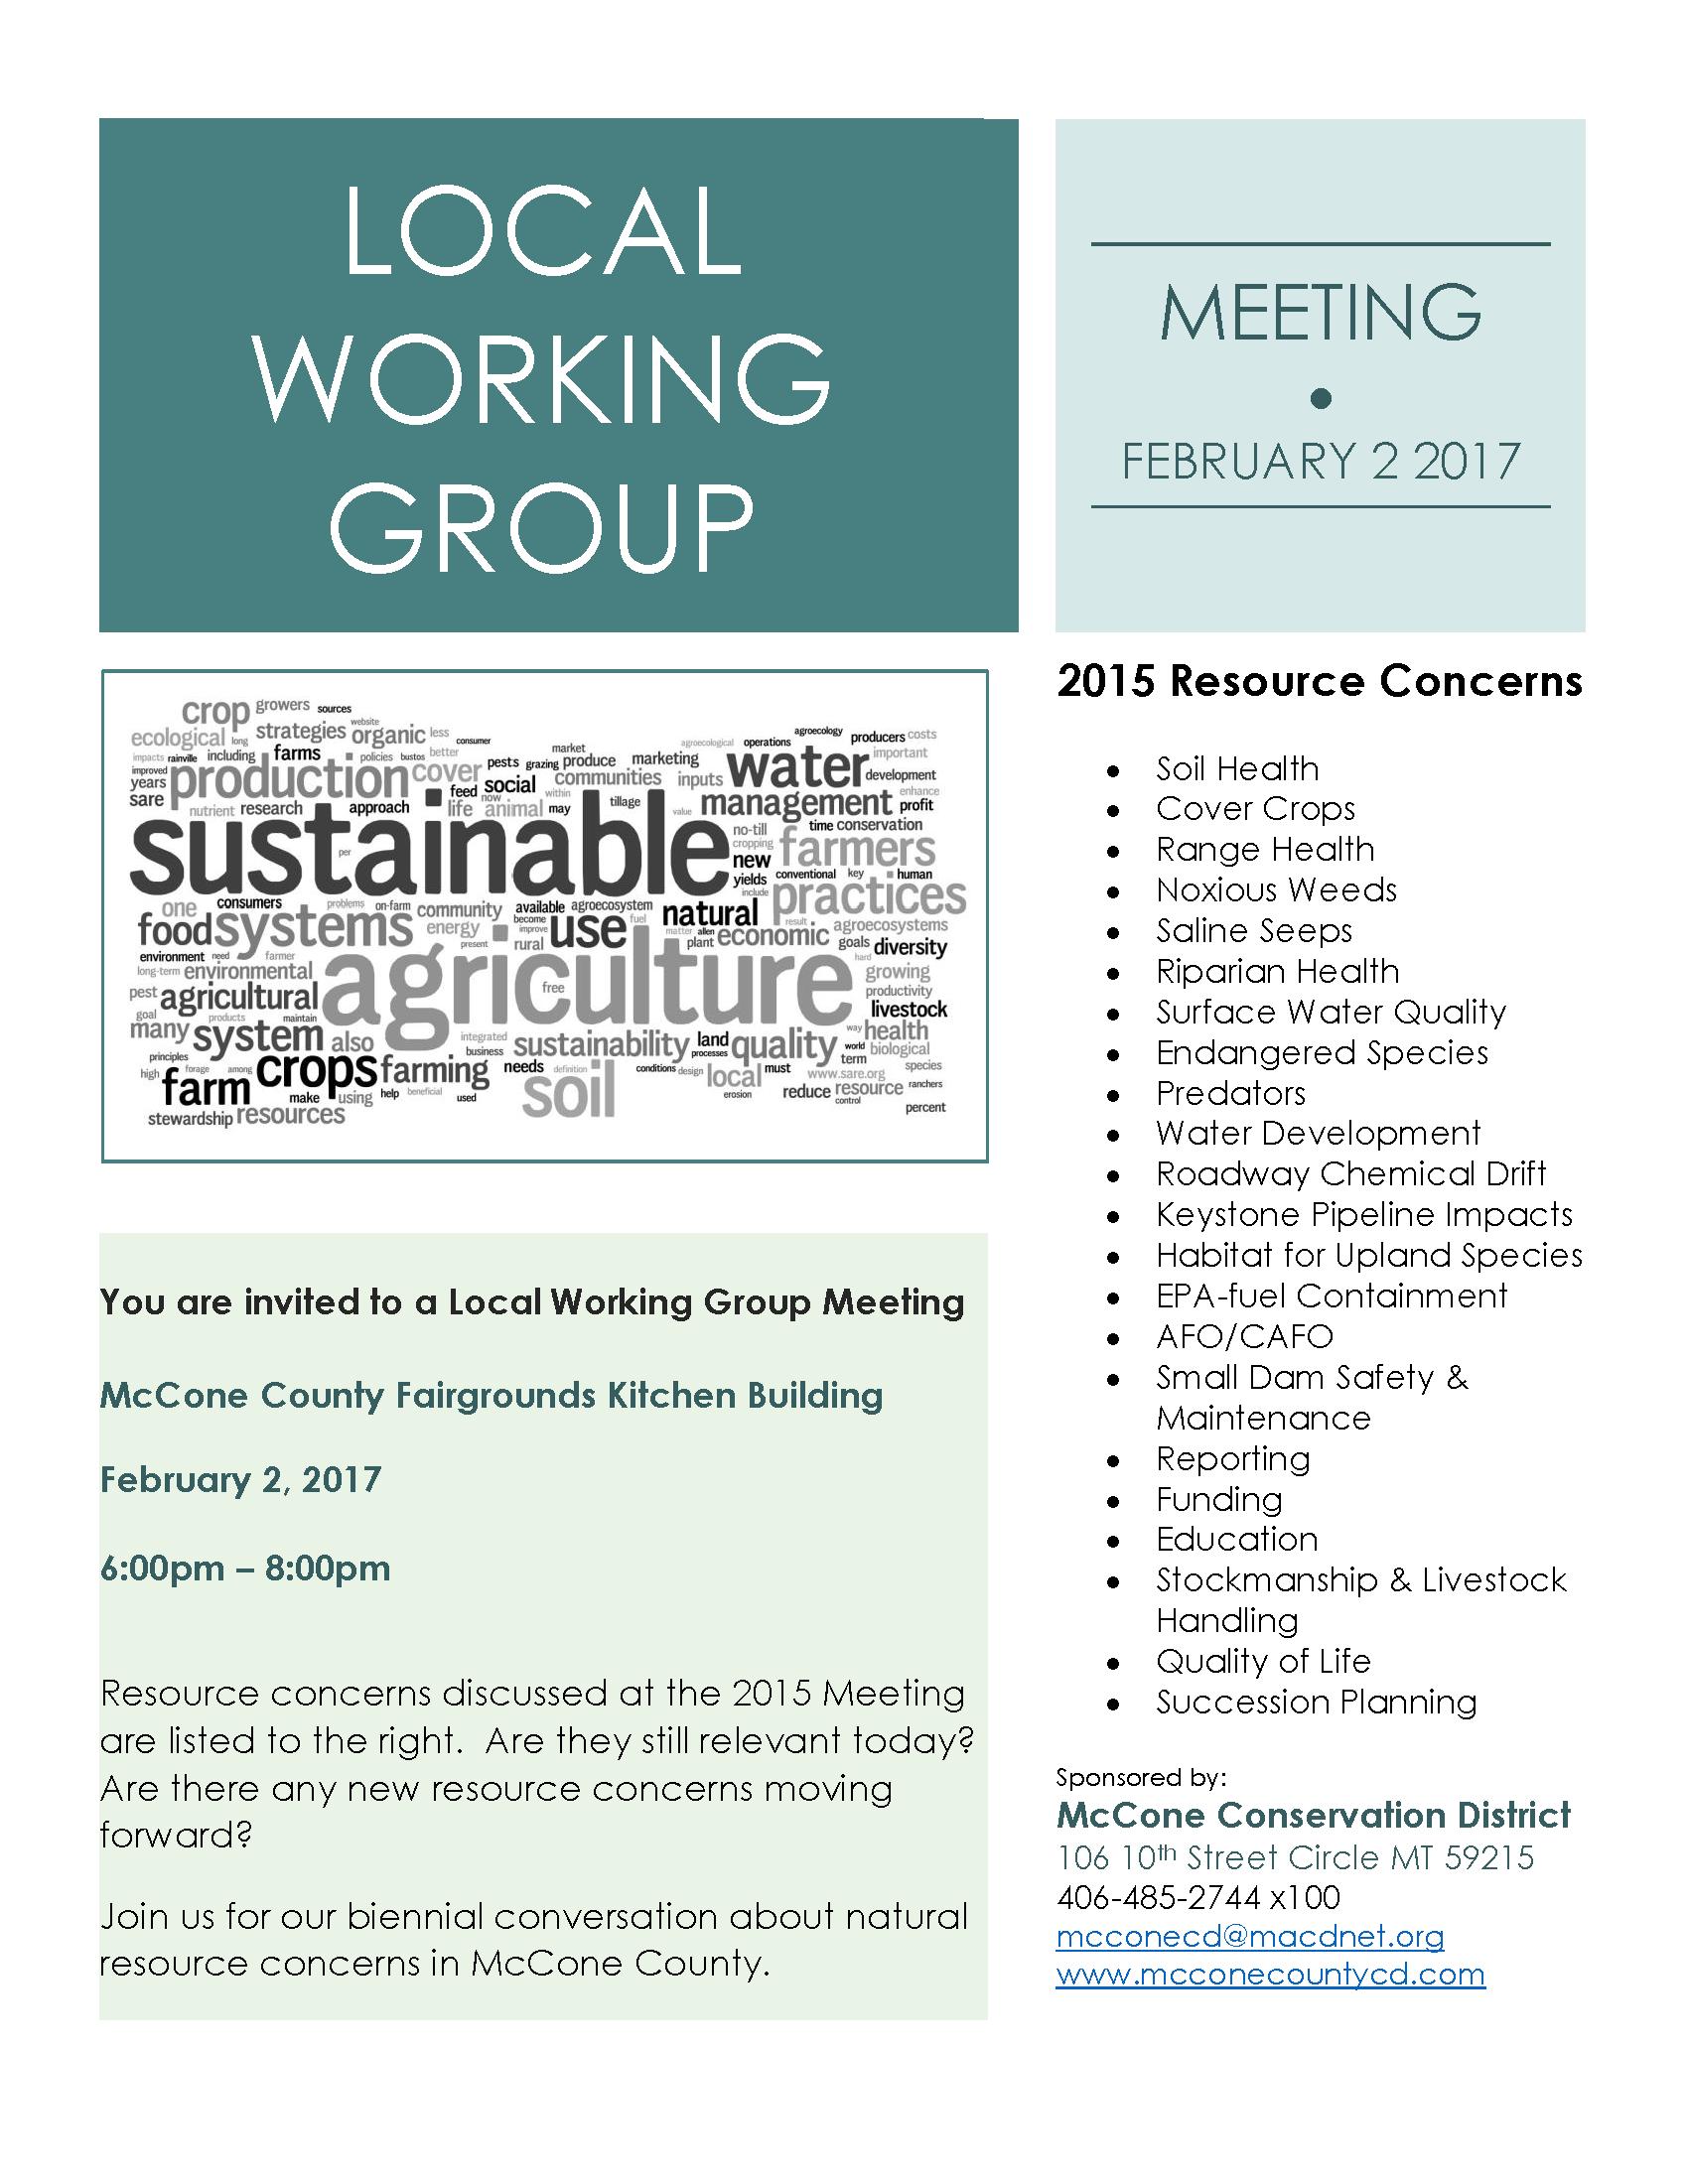 Montana mccone county circle - February 2 Local Working Group Meeting